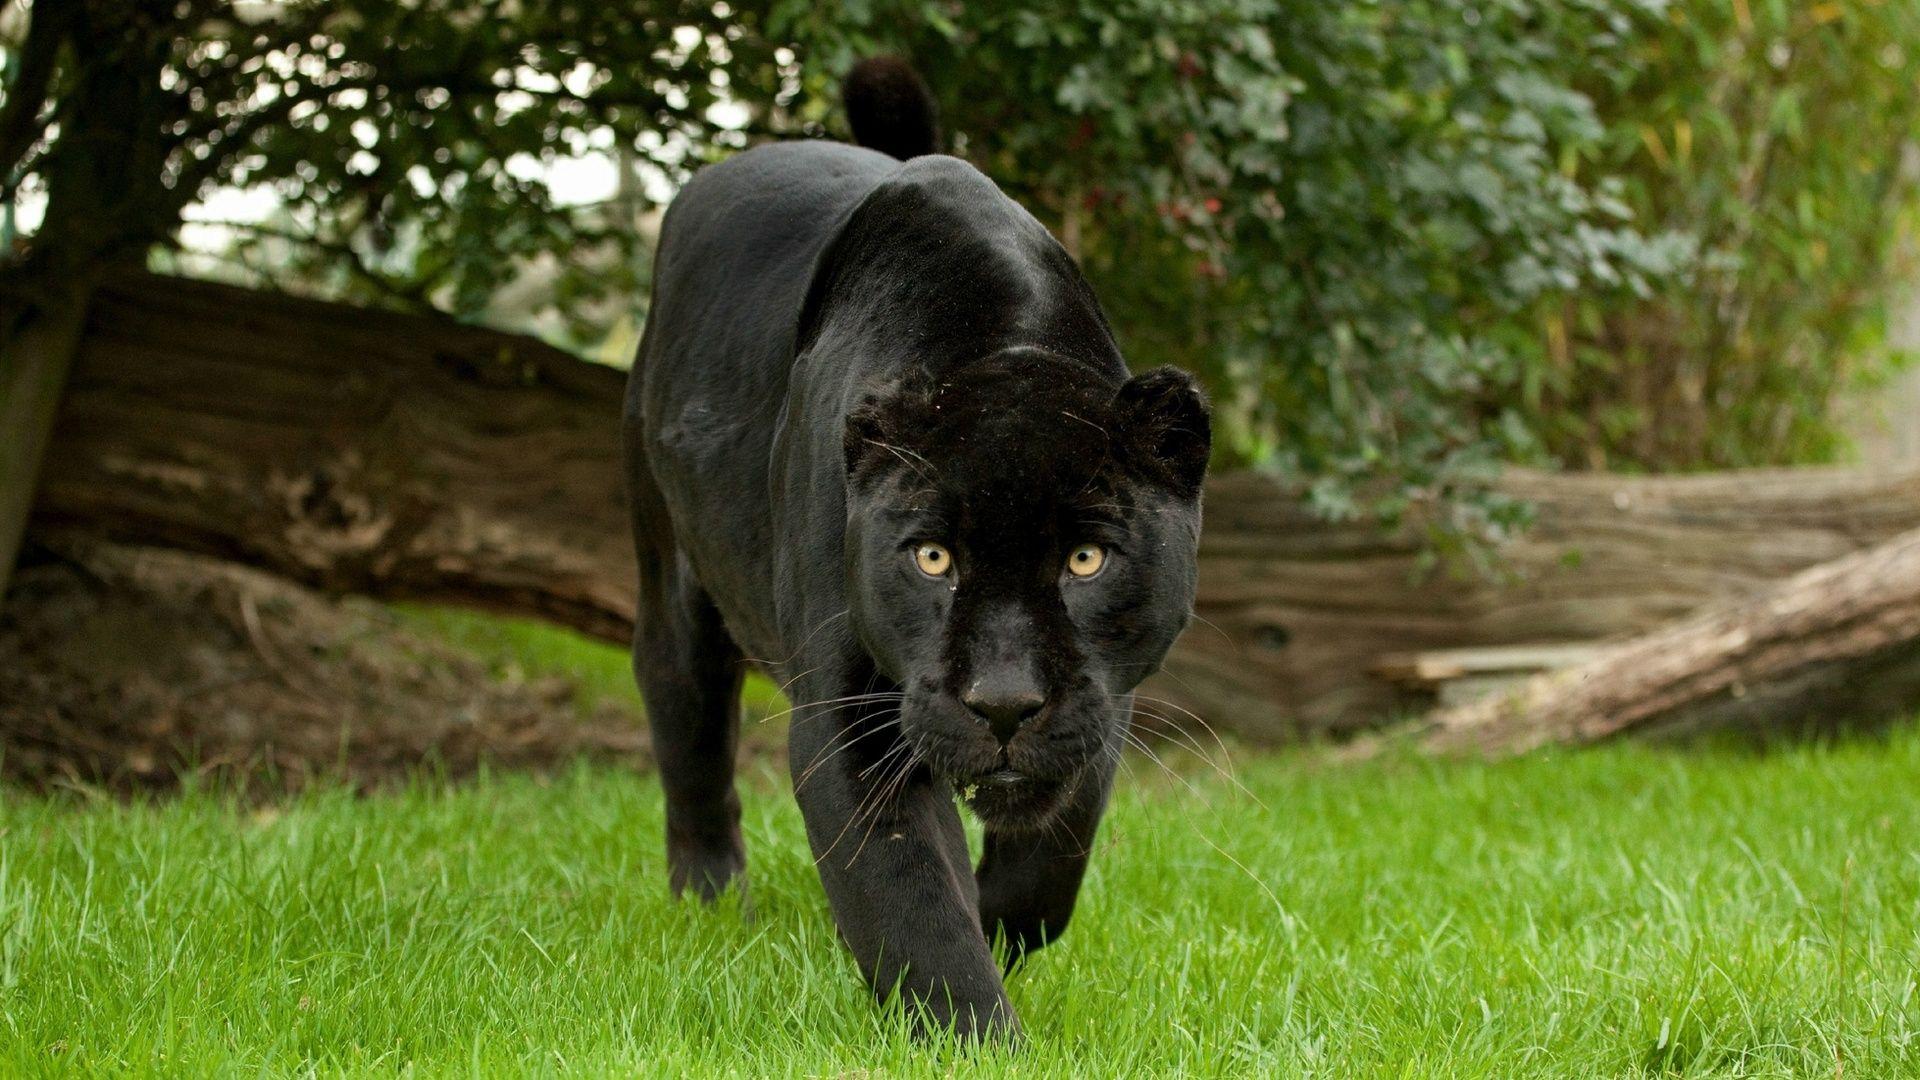 pinjason aronsson on gbwallpapers | pinterest | black jaguar